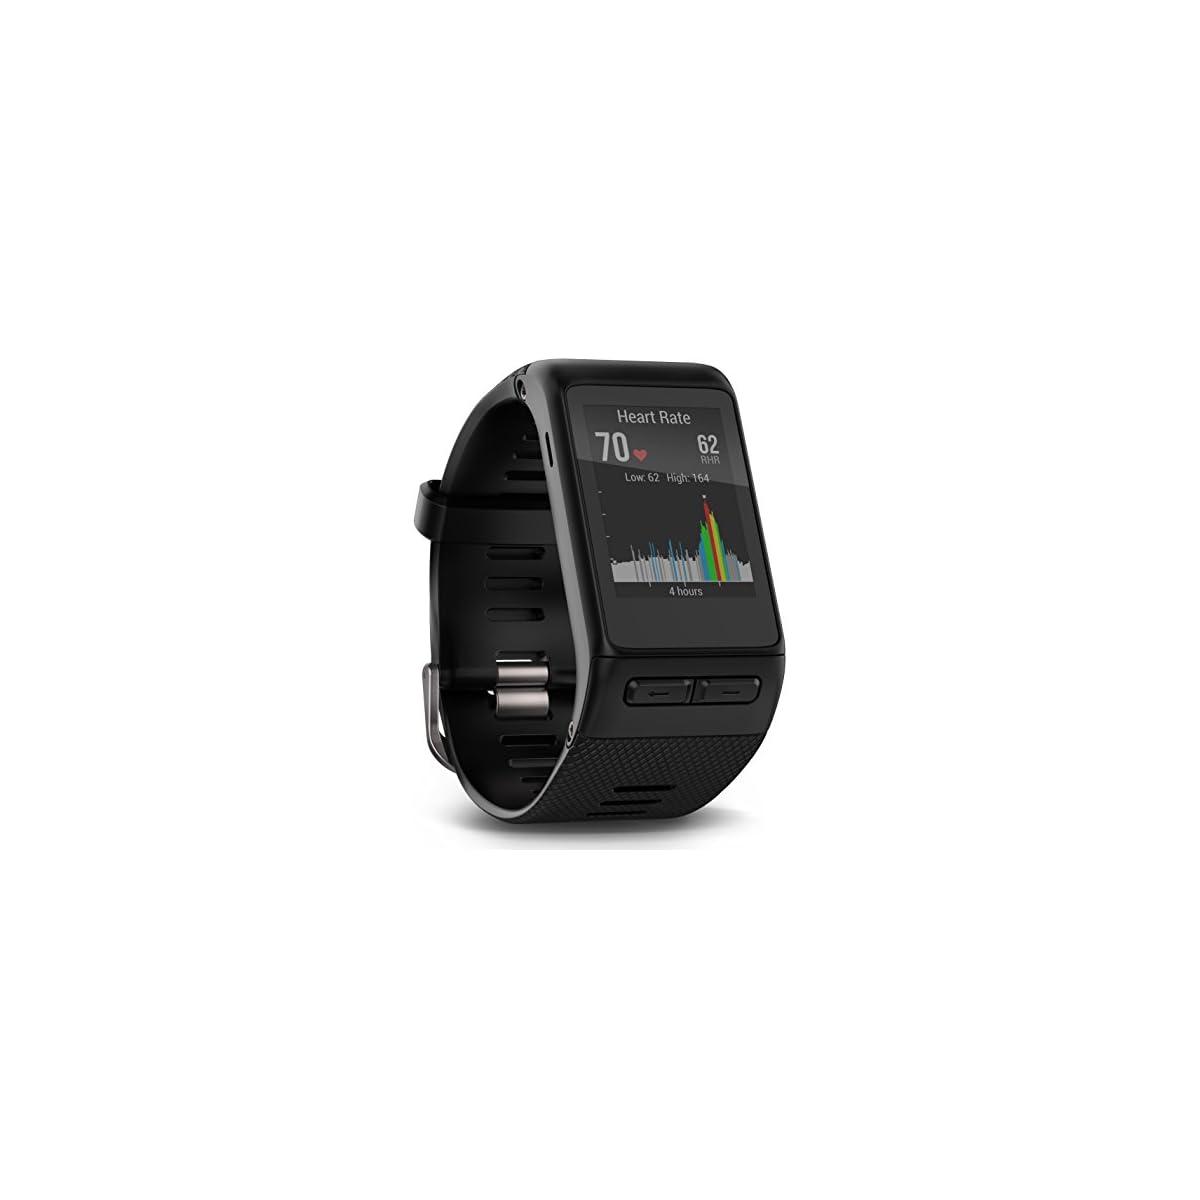 41J6EQywWYL. SS1200  - Garmin Vívoactive HR - Reloj con pulsómetro Integrado, Unisex, Color Negro, Talla XL (Reacondicionado Certificado)